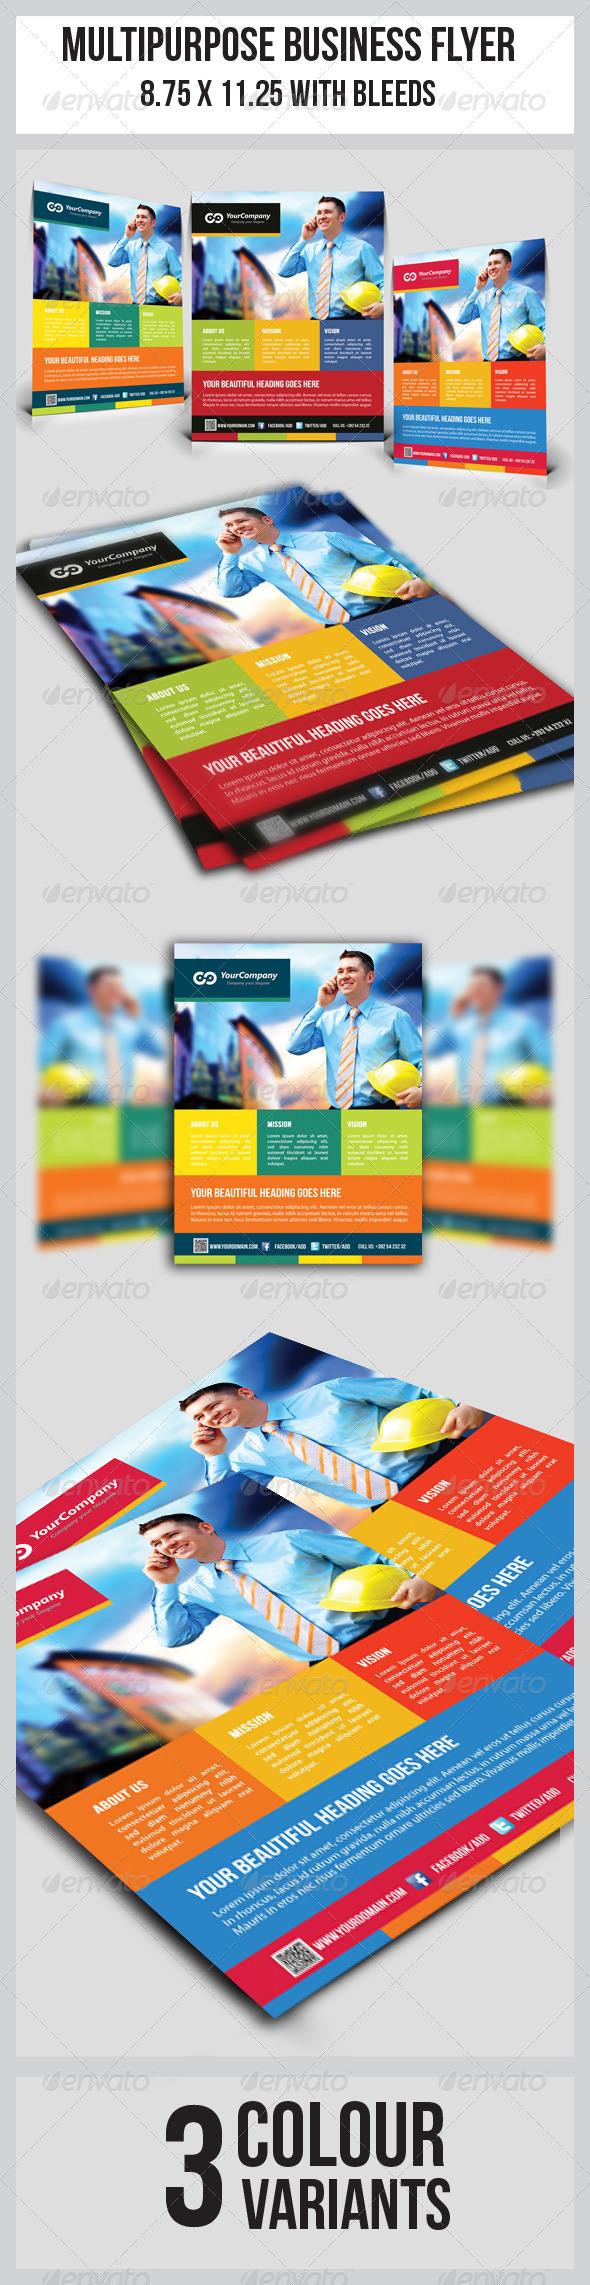 Multipurpose Business Flyer  - Corporate Flyers